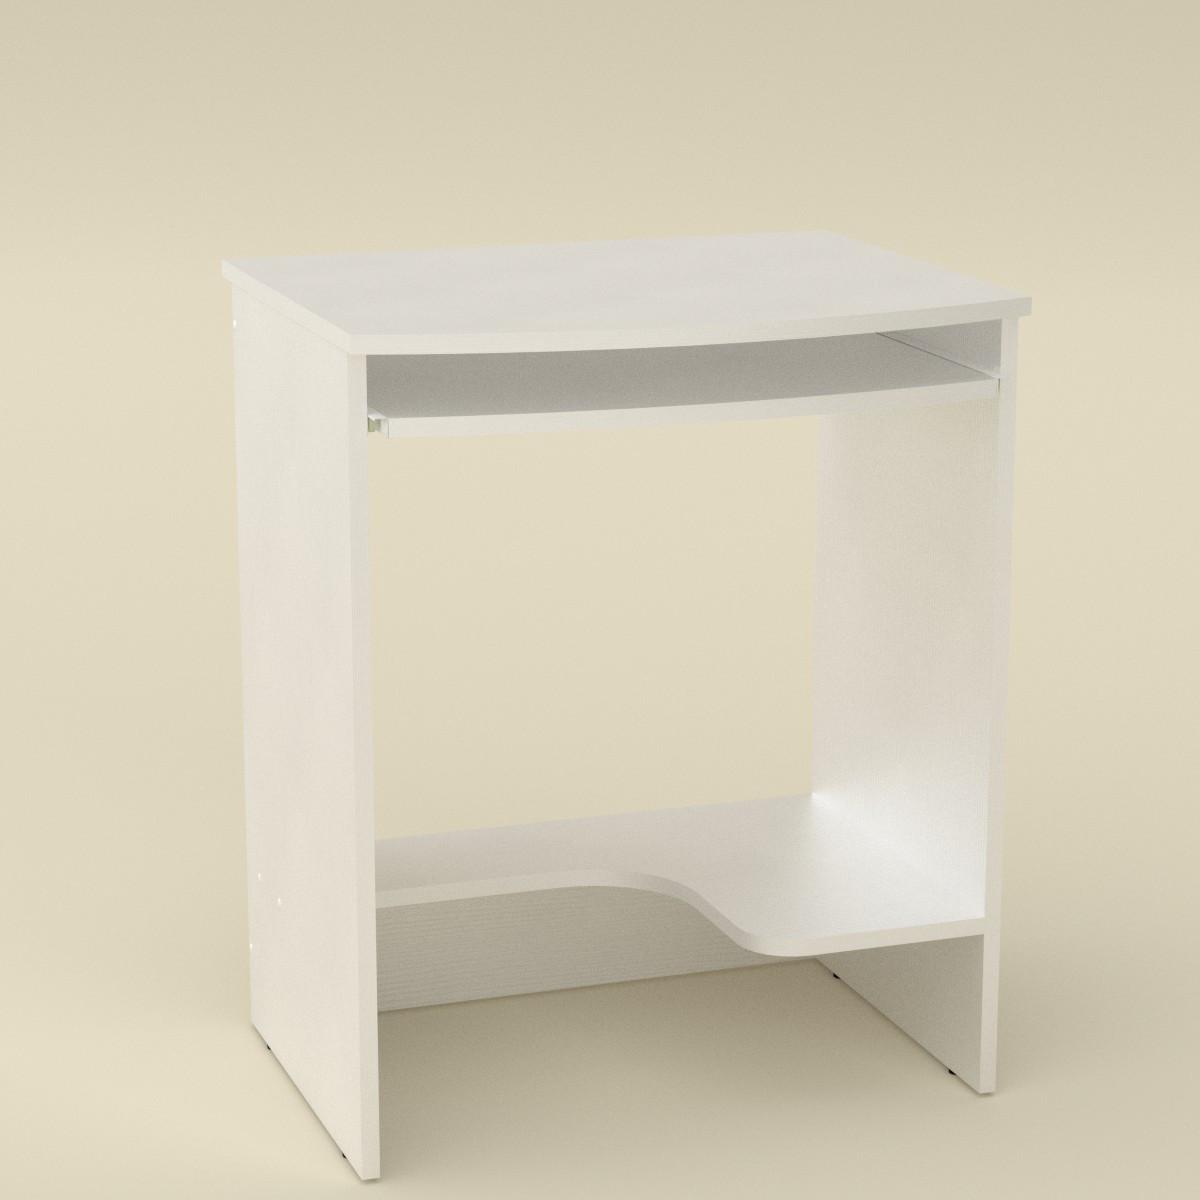 Стол компьютерный СКМ-13 белый Компанит (61х50х74 см), фото 1